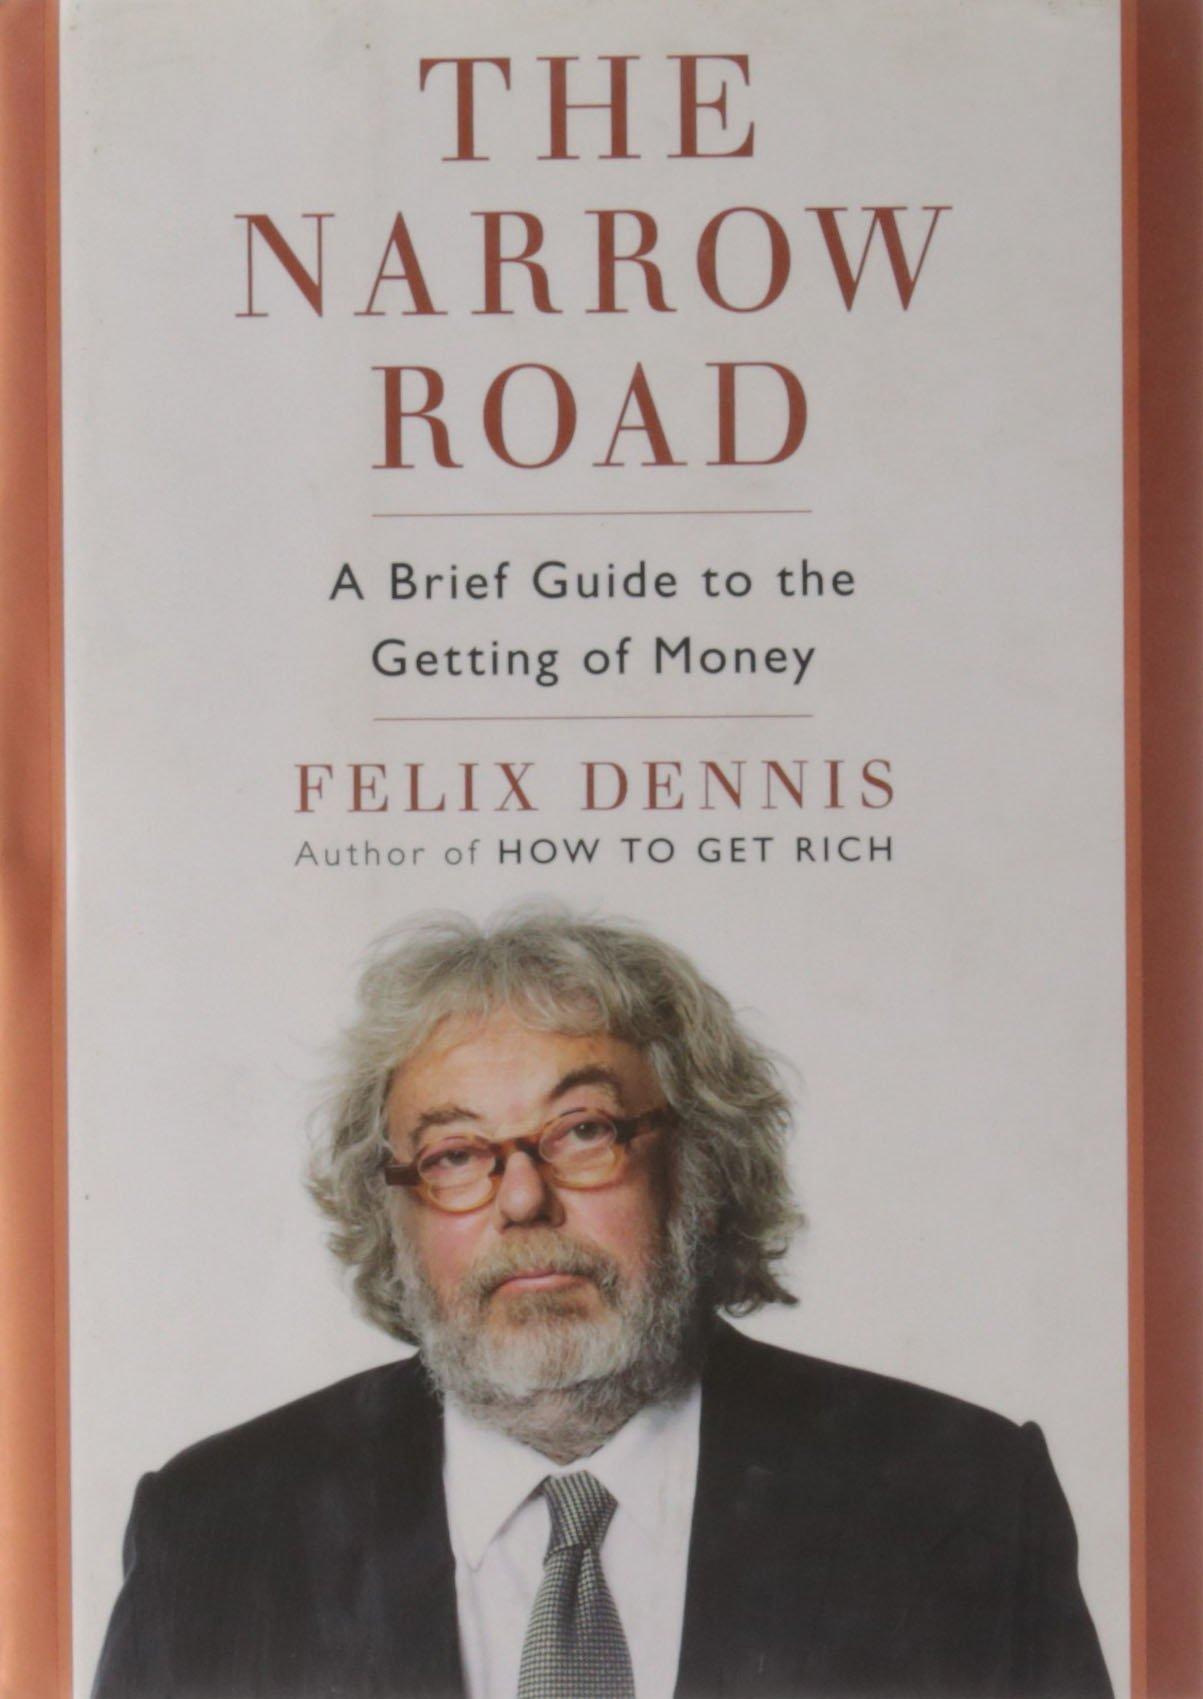 the-narrow-road-88-tips-from-maxim-founder-felix-dennis-2